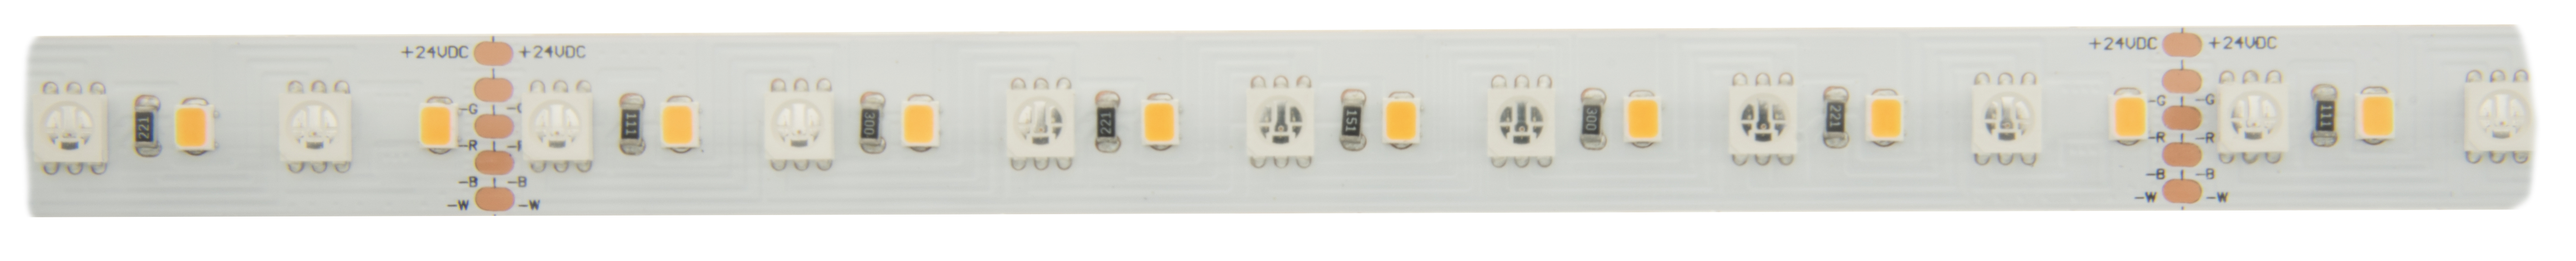 1 Stk Flexstrip 115 RGB-WW Ra=90+ 15W/m 1187lm/m, 24VDC IP44, l=5m LIFS009205